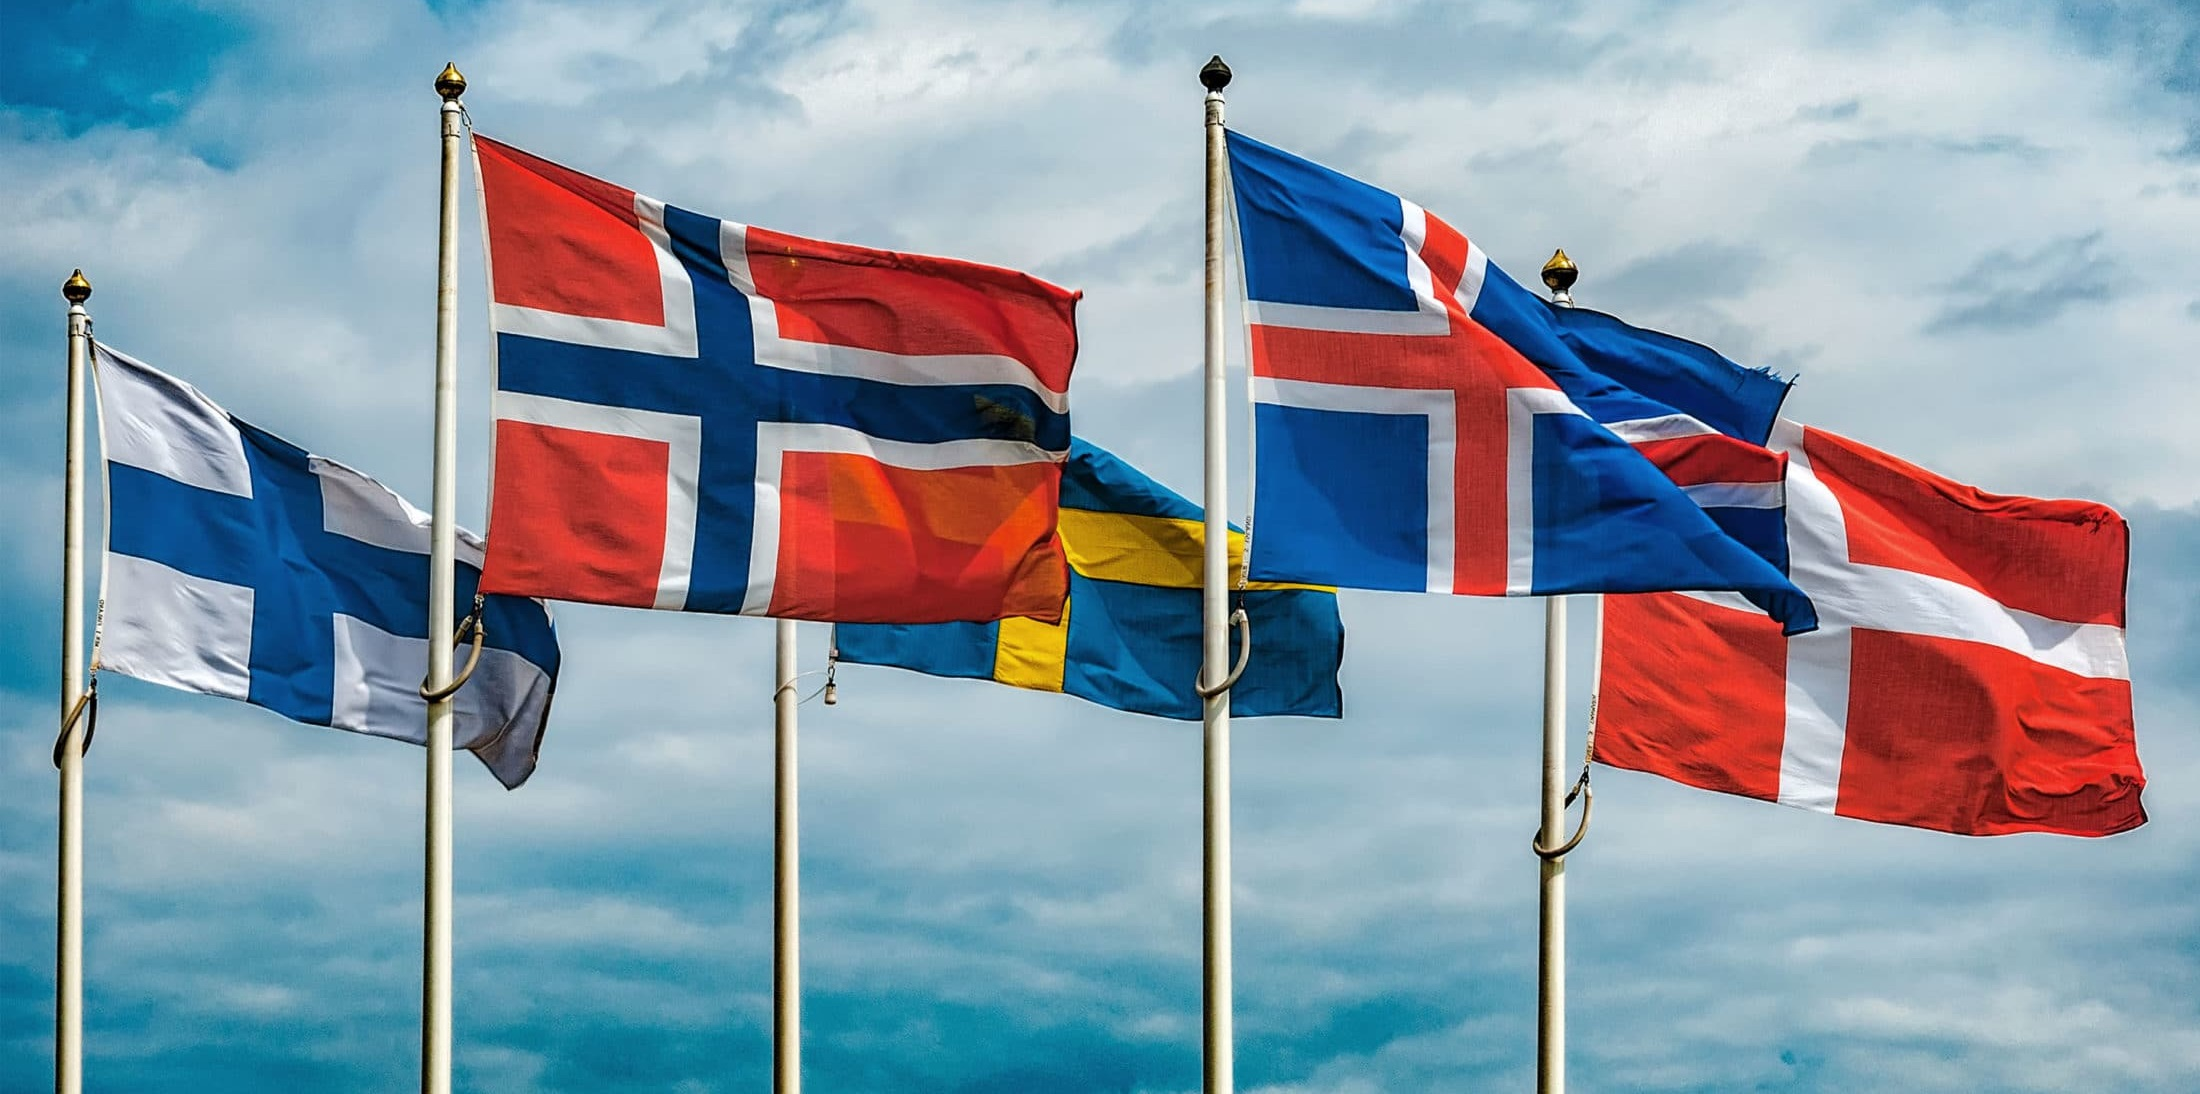 Almost full house in Scandinavia